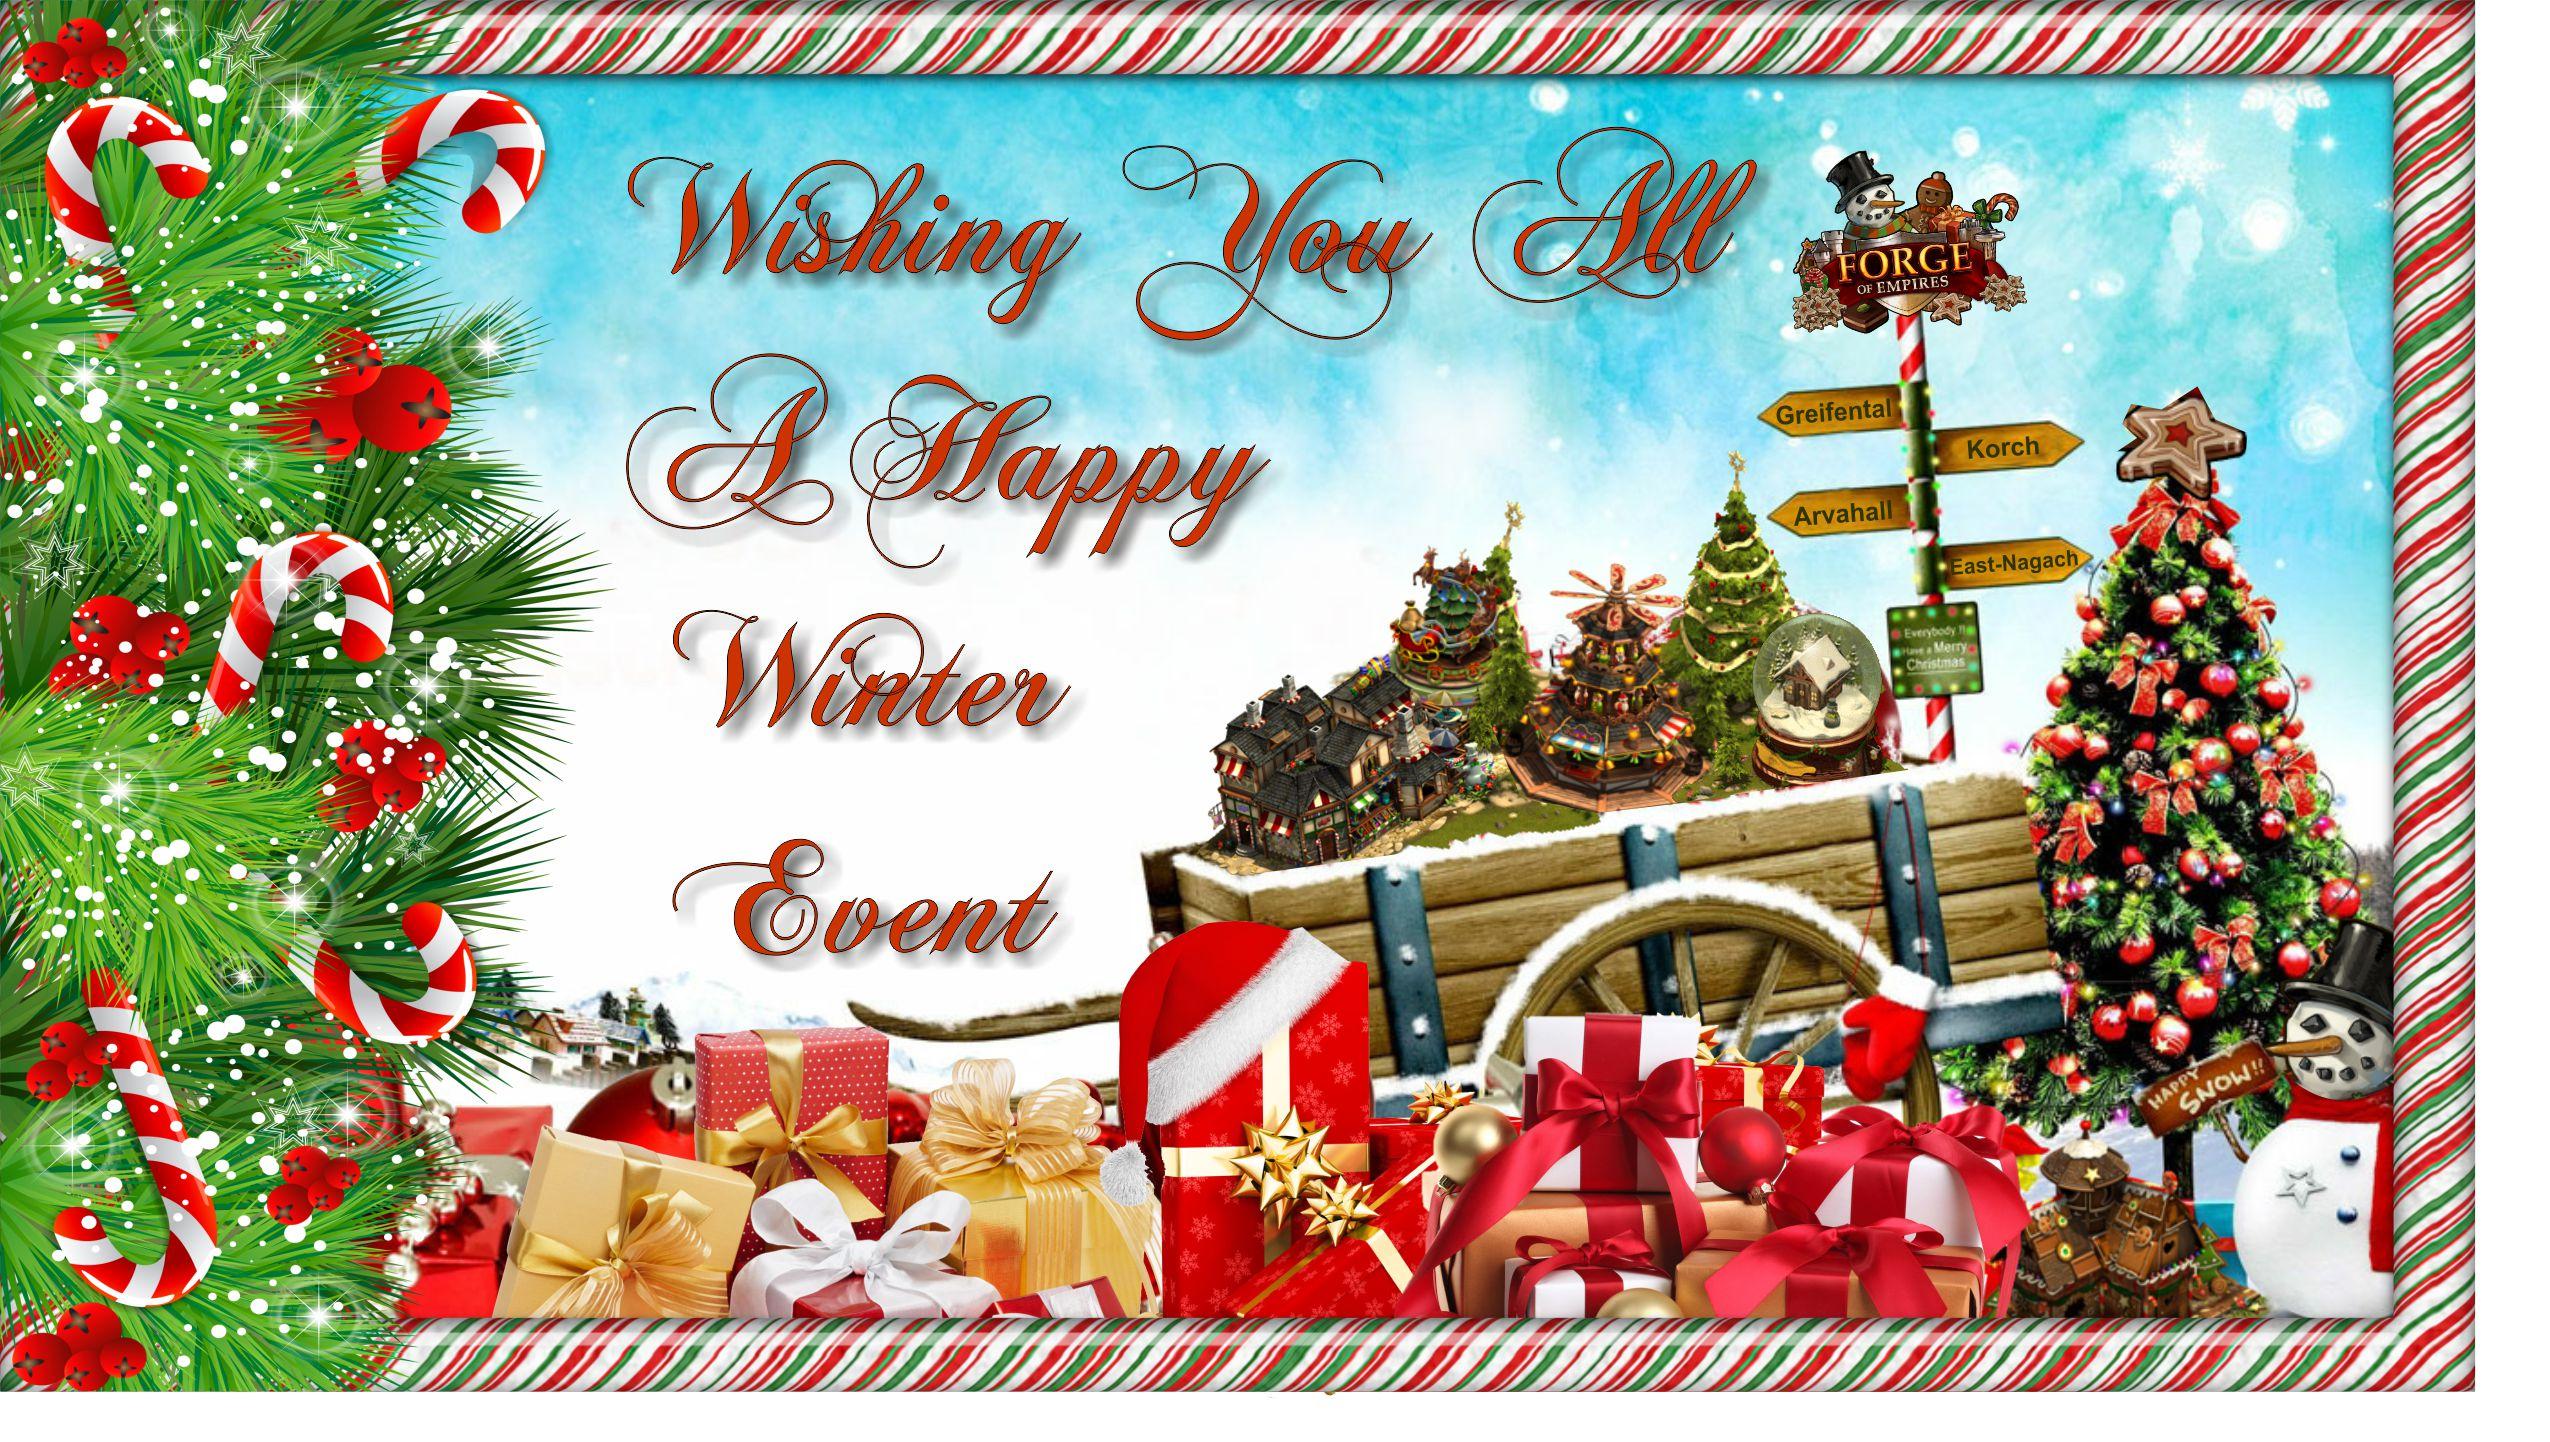 FOE Winter Card Telajayra.jpg